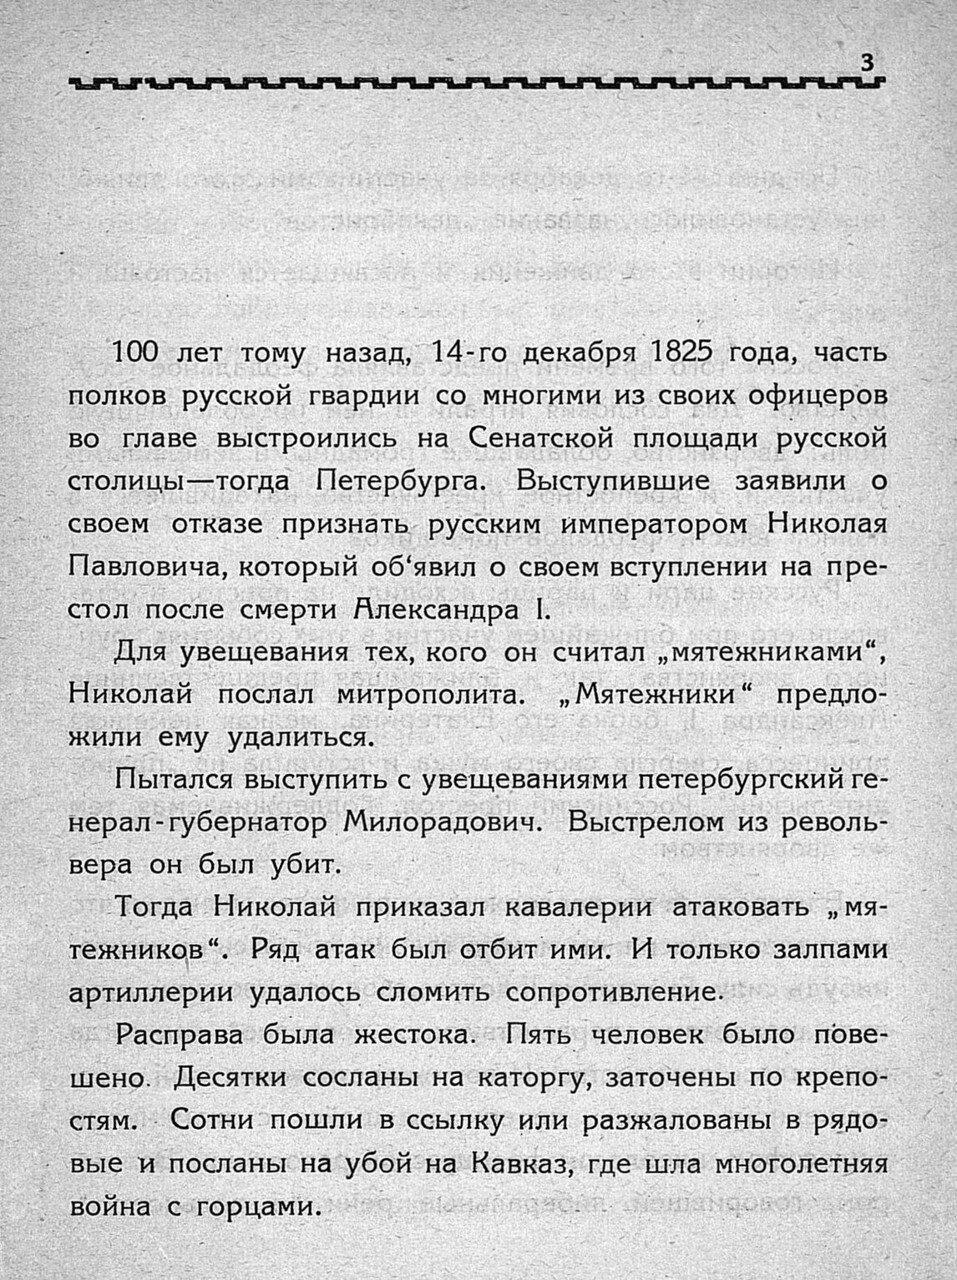 https://img-fotki.yandex.ru/get/60682/199368979.23/0_1bfac7_b8122888_XXXL.jpg